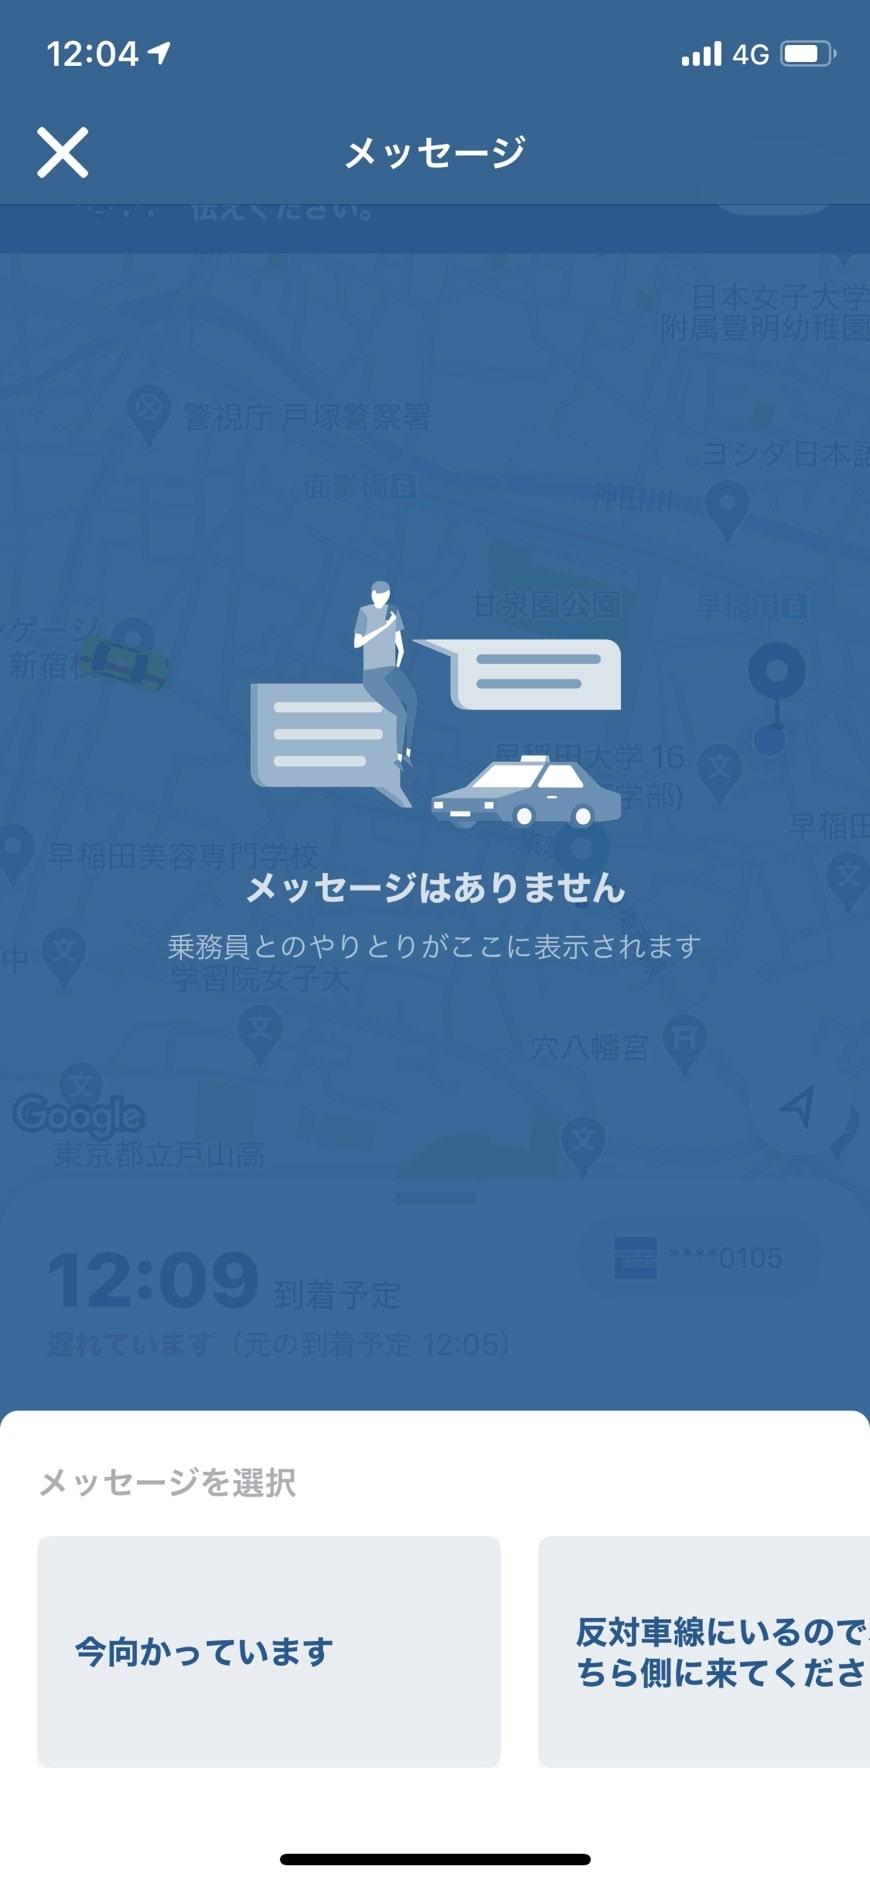 MOVタクシーアプリでドライバーにメッセージを送信